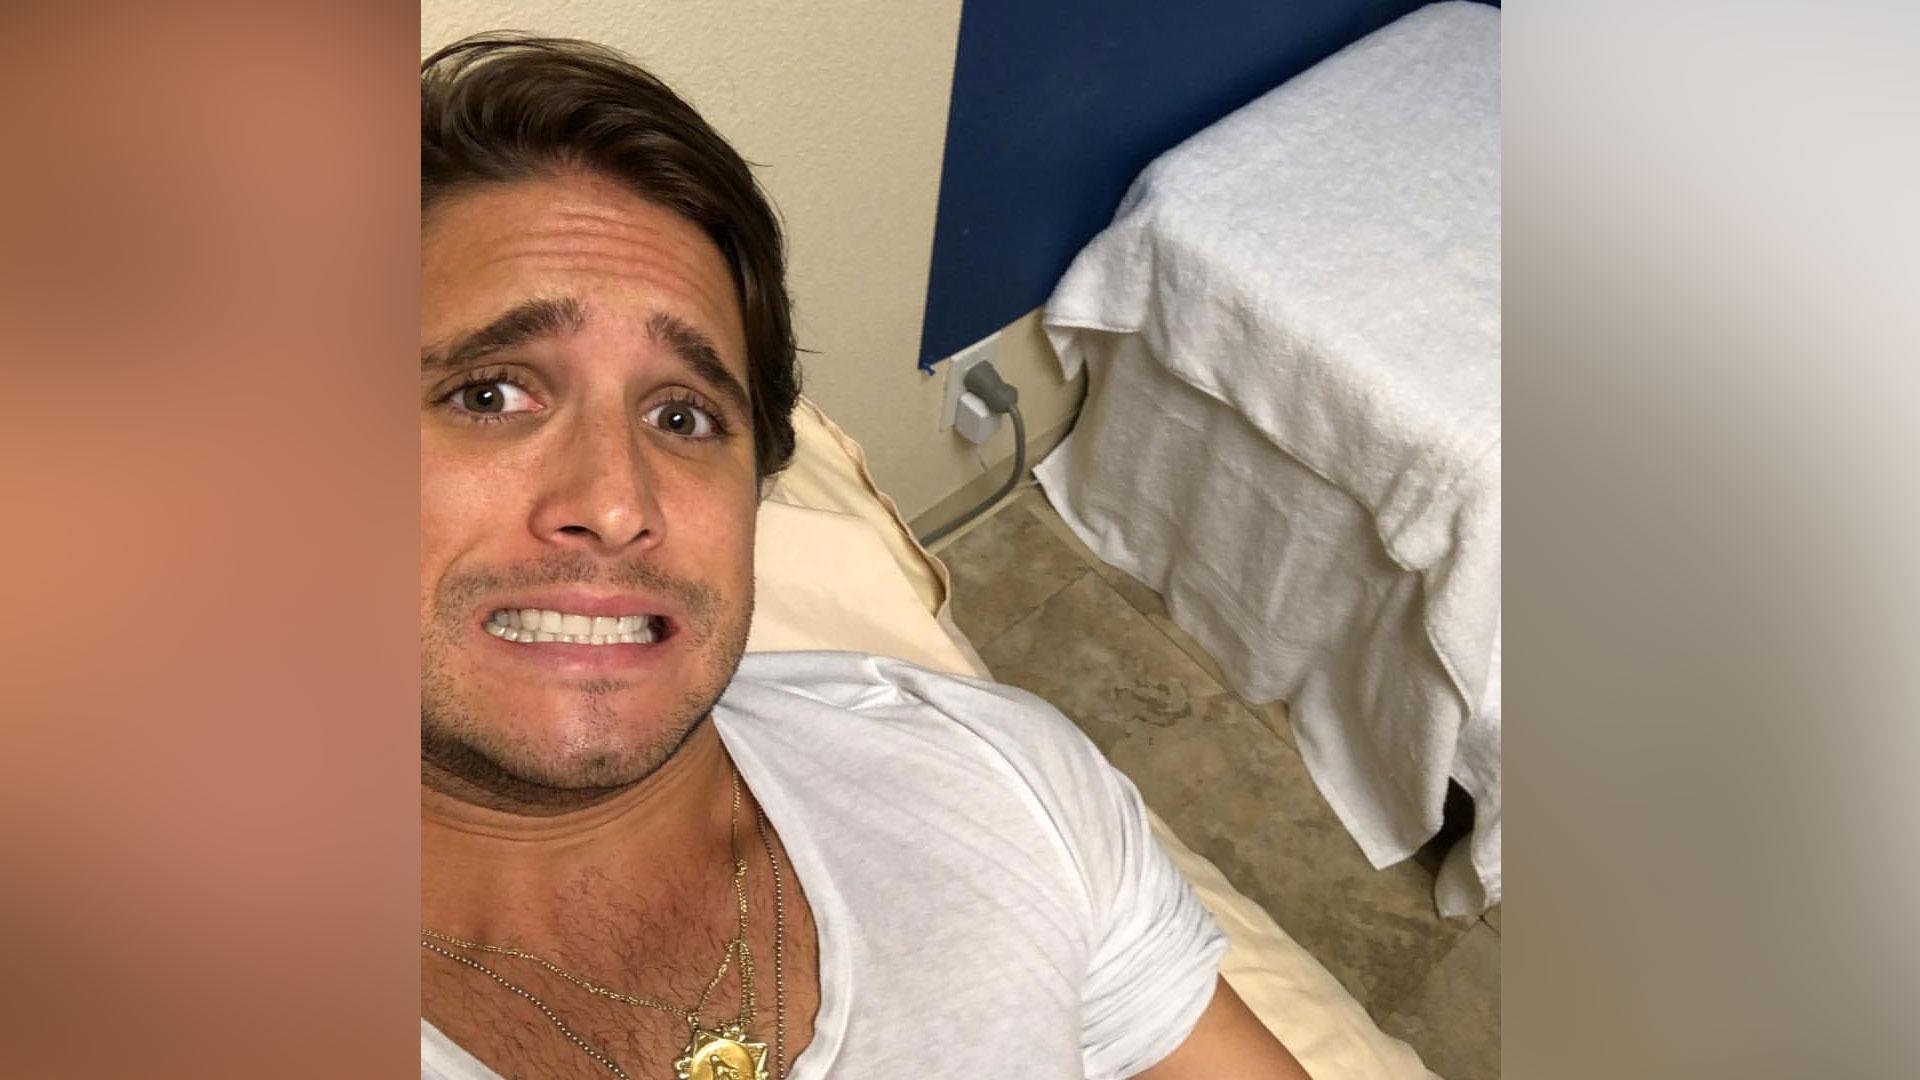 Diego Boneta Terminó En El Doctor Con Suero Video Telemundo